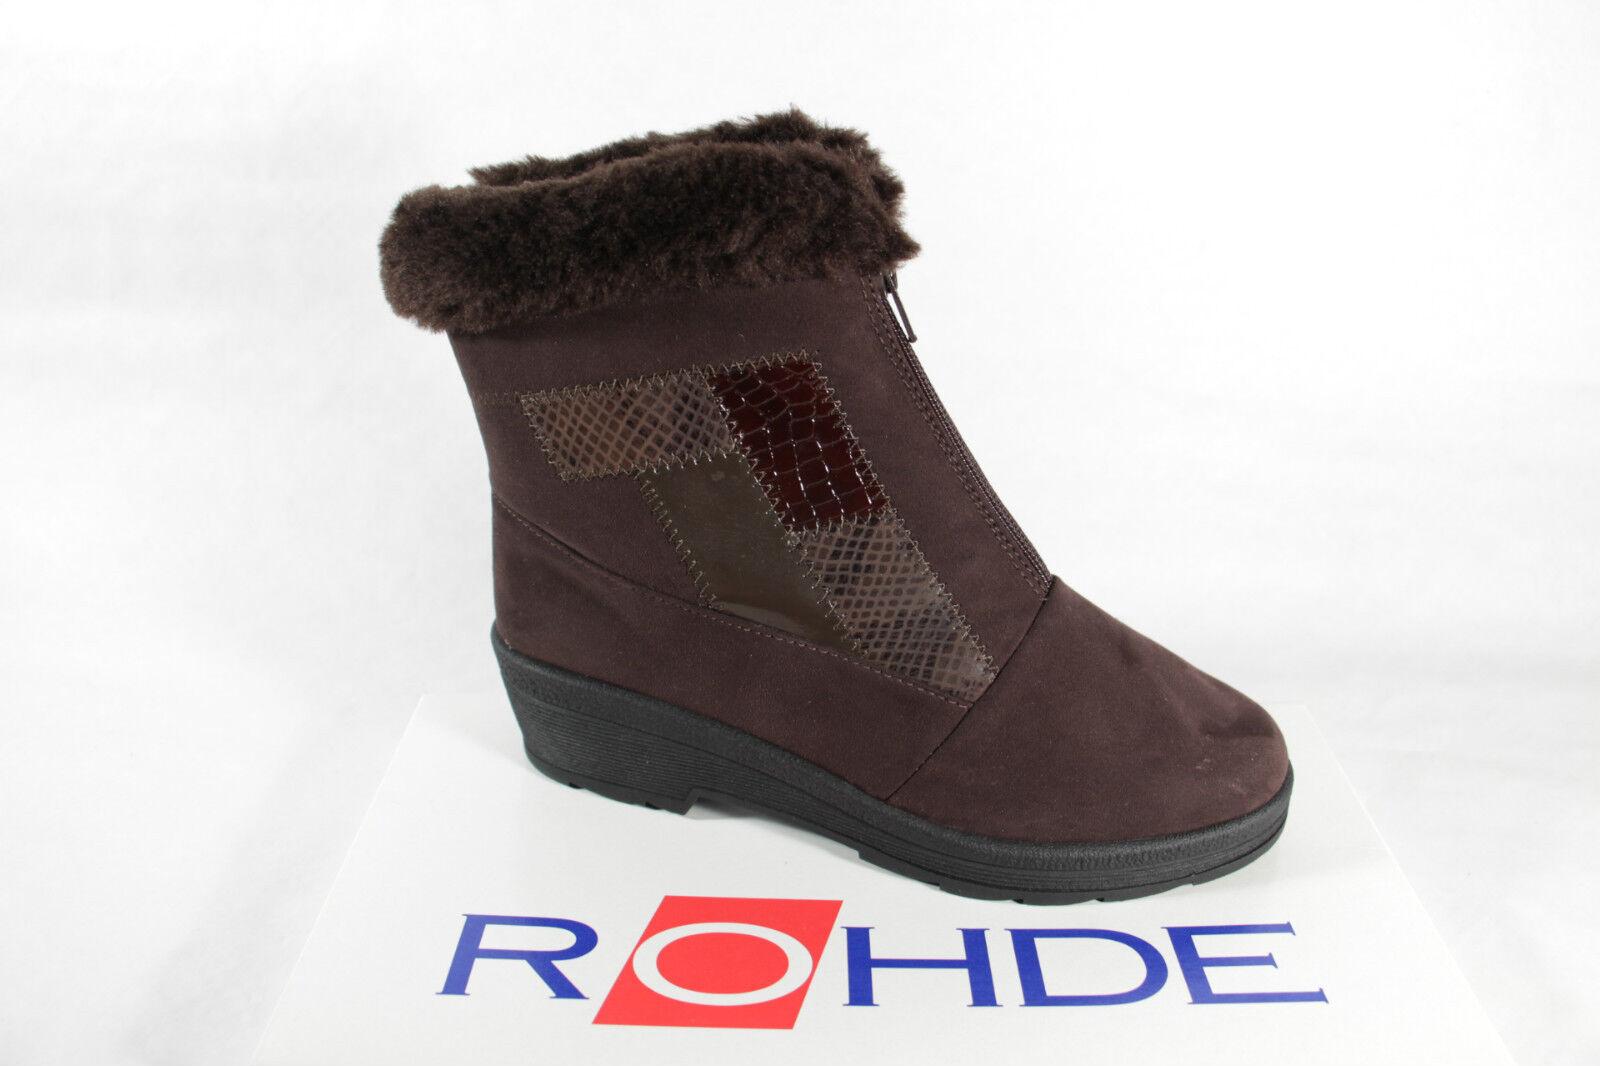 Rohde Damen Stiefel Stiefel Stiefel Stiefel Stiefeletten Winterstiefel braun Sympatex Neu  e6f2b2